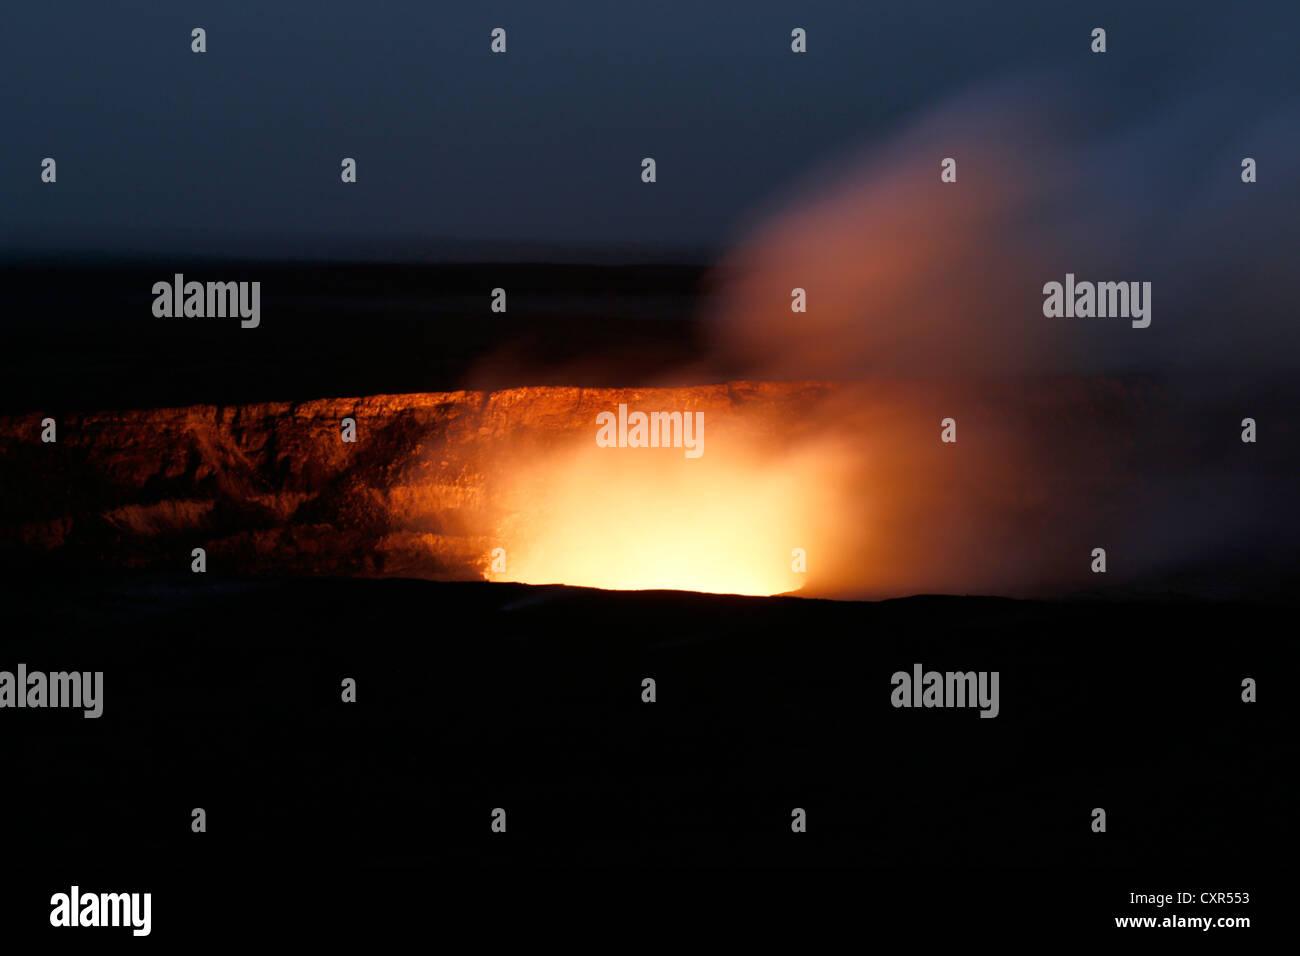 Halemaumau crater glow at night, Hawaii Volcanoes National Park, Big Island of Hawaii, USA - Stock Image